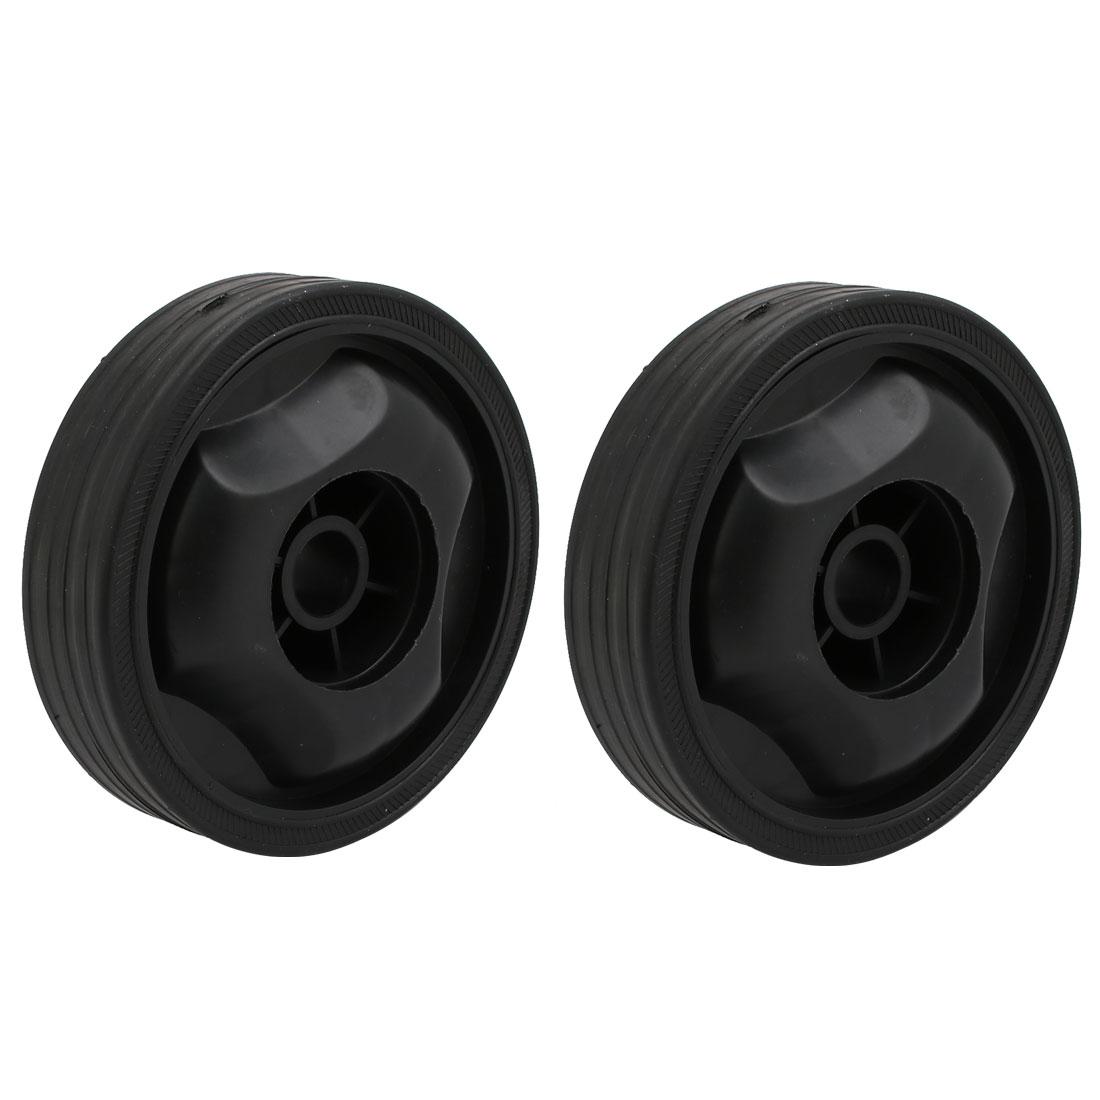 115mmx16.5mm Plastic Air Compressor Replacement Parts Wheel Casters Black 2pcs